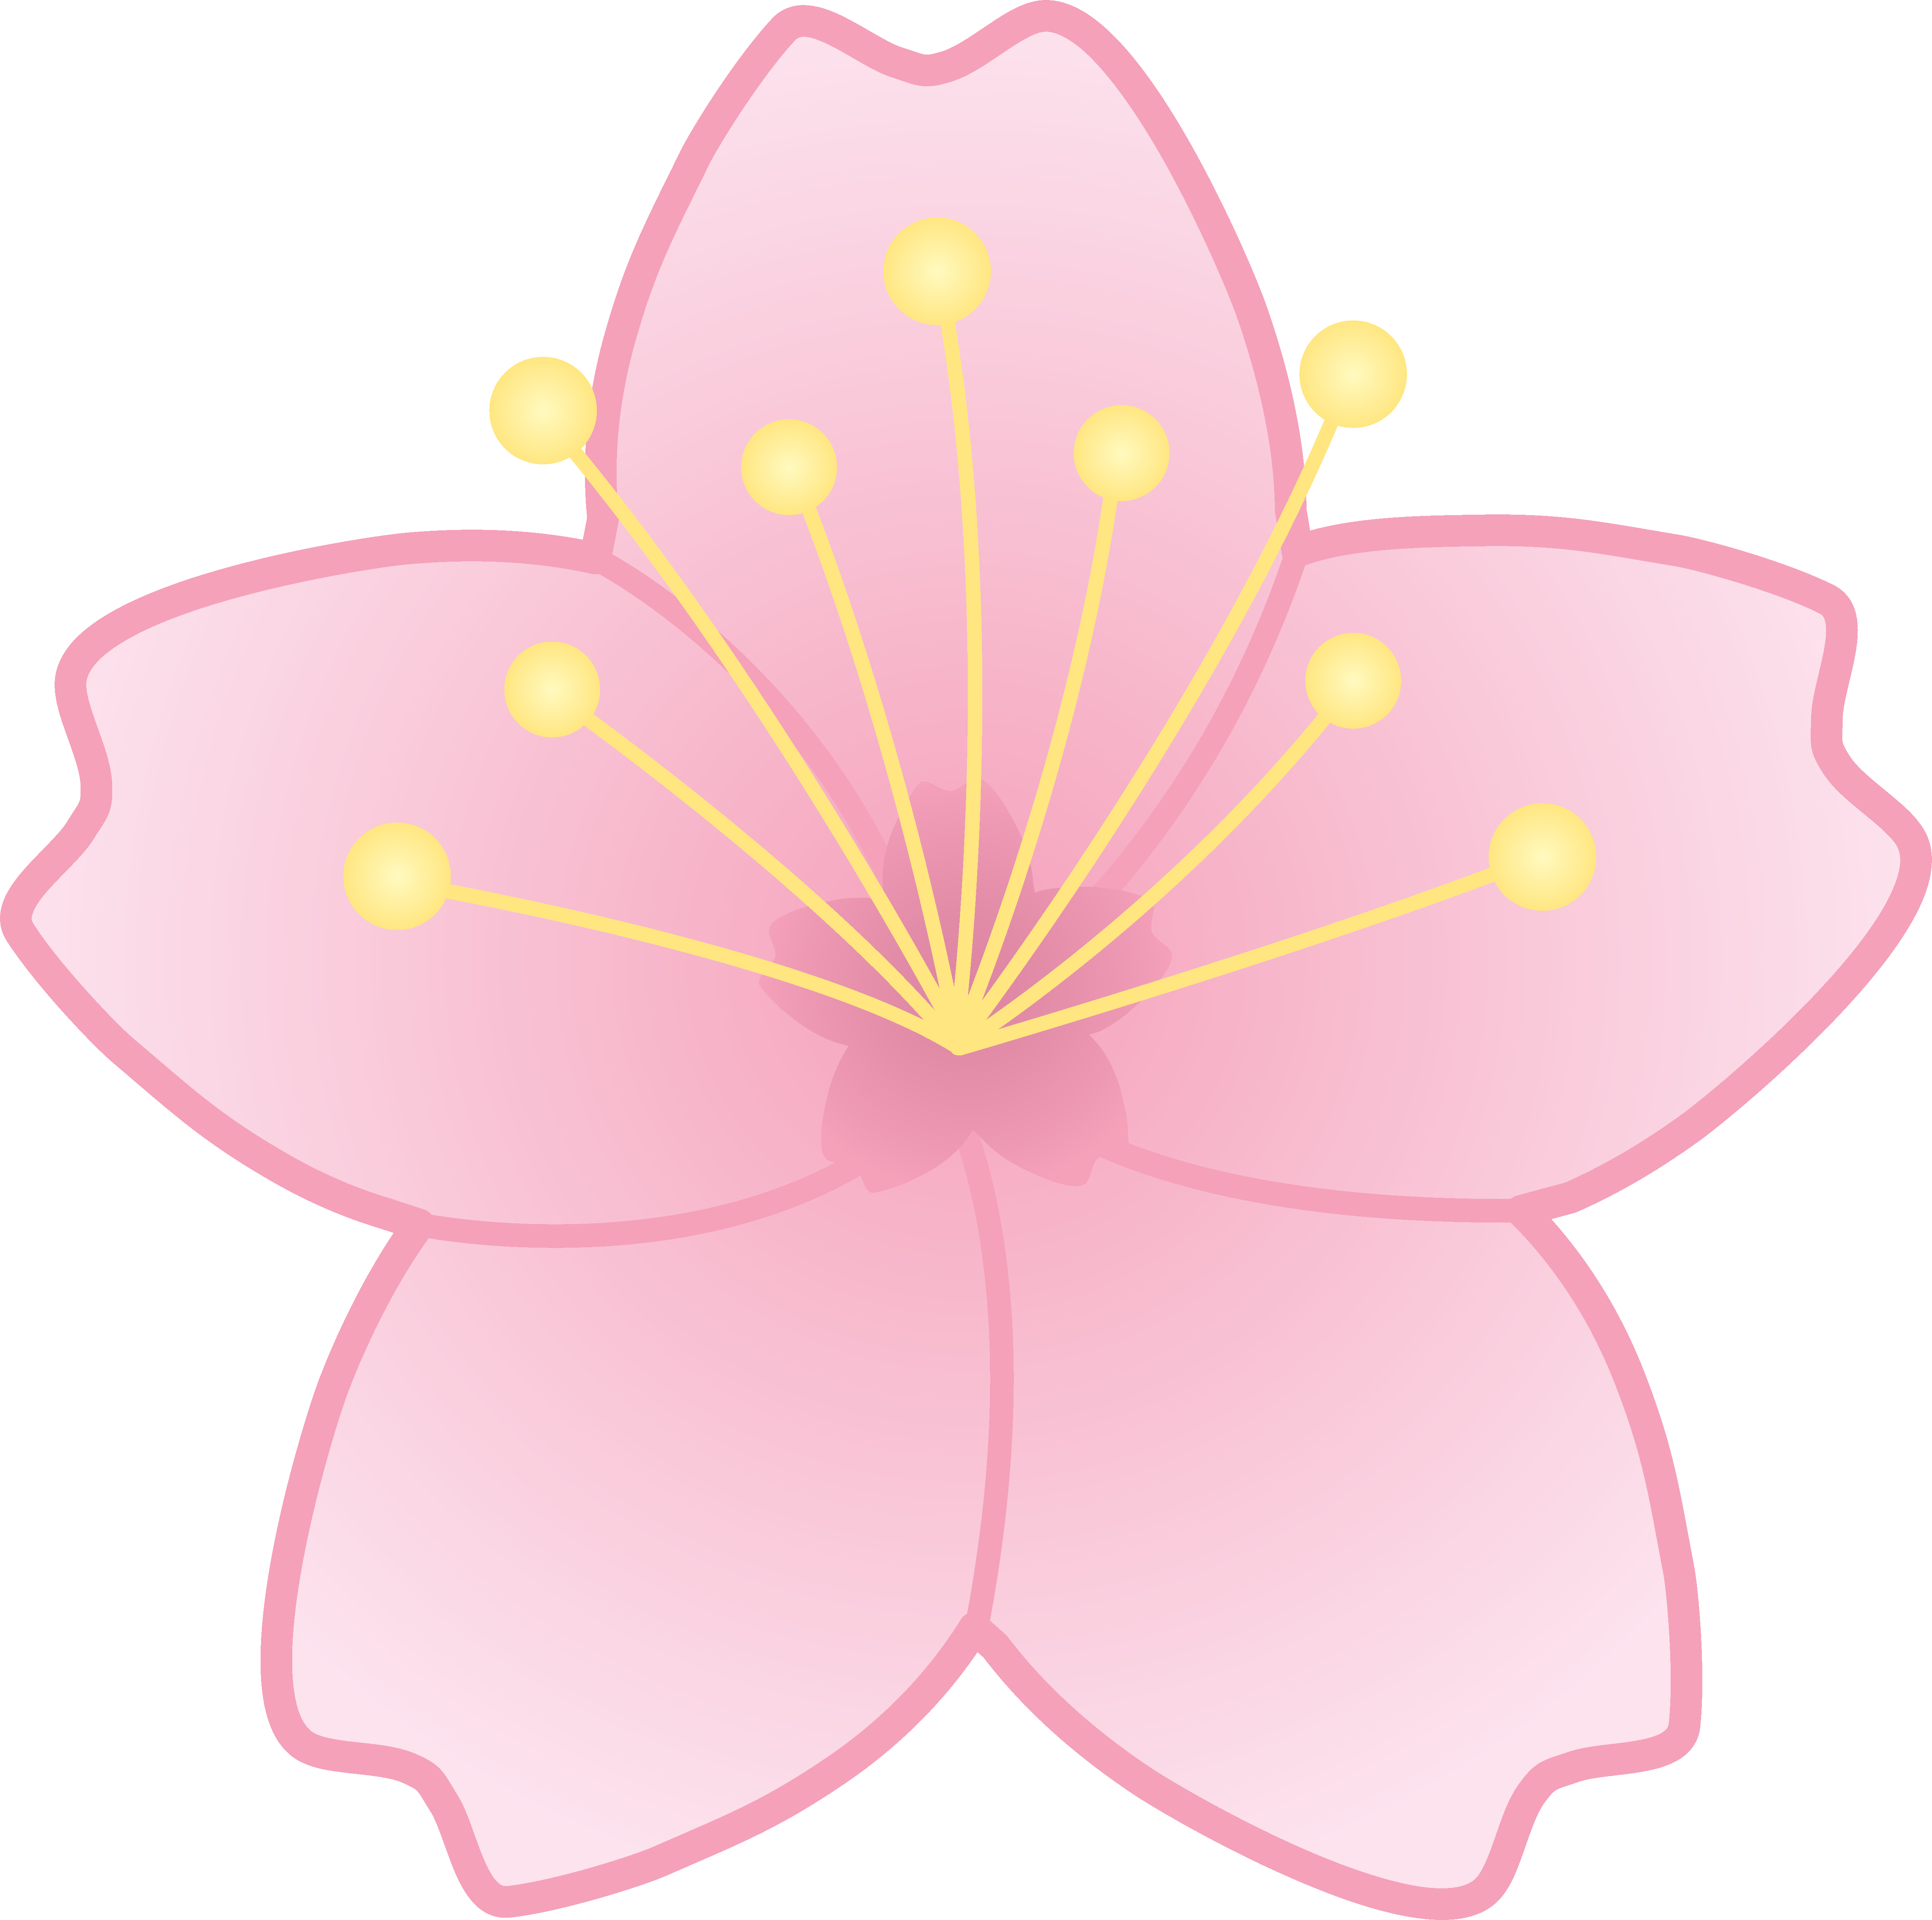 5063x5032 Pink Cherry Blossom Flower